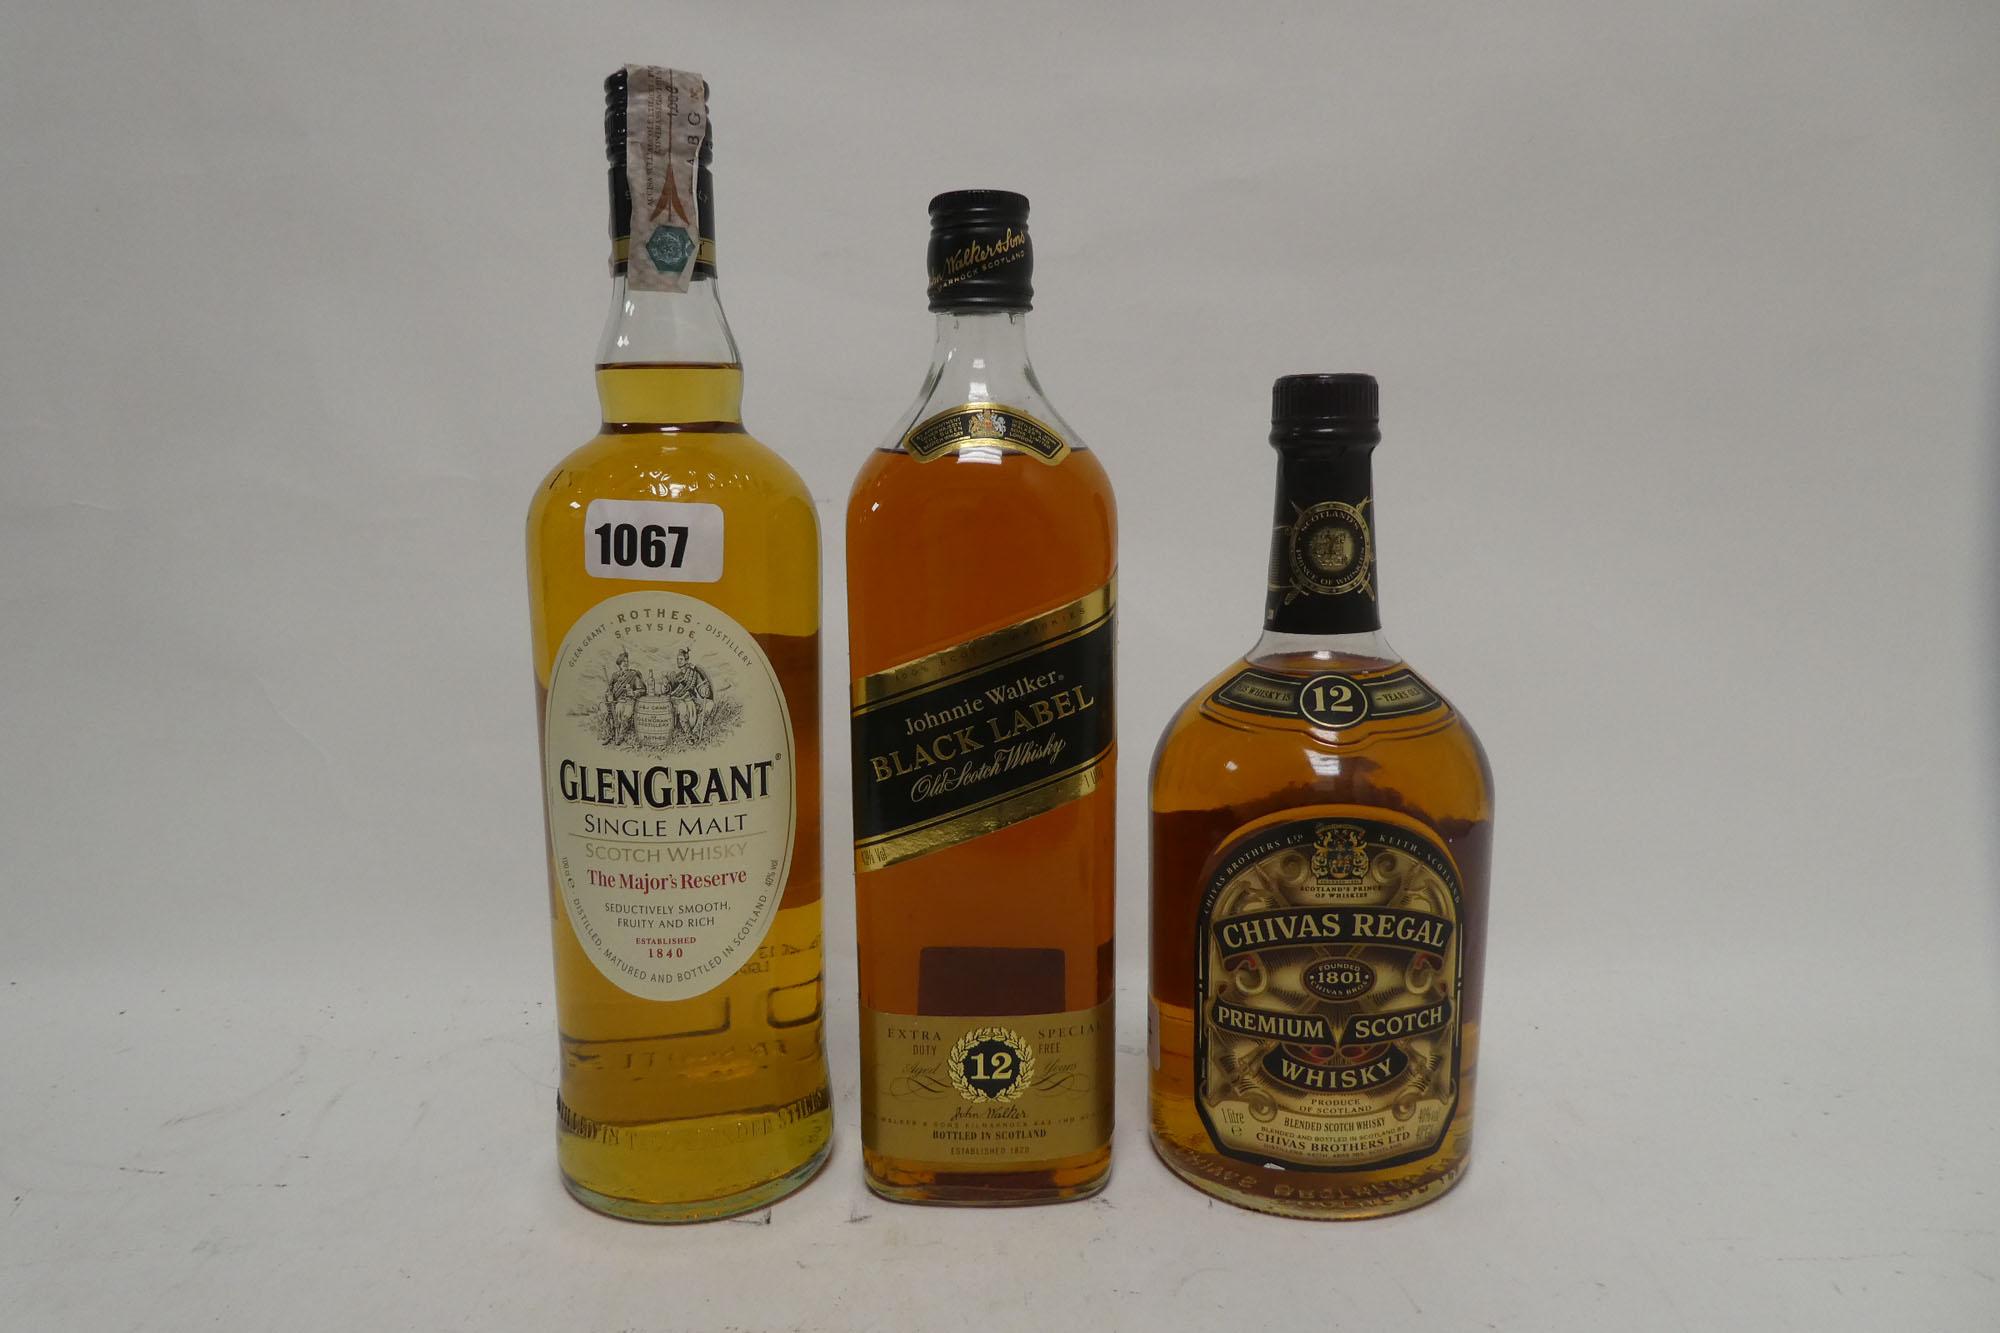 3 bottles, 1x Johnnie Walker Black Label 12 year old Scotch Whisky Duty Free label 1 Litre 43%, 1x